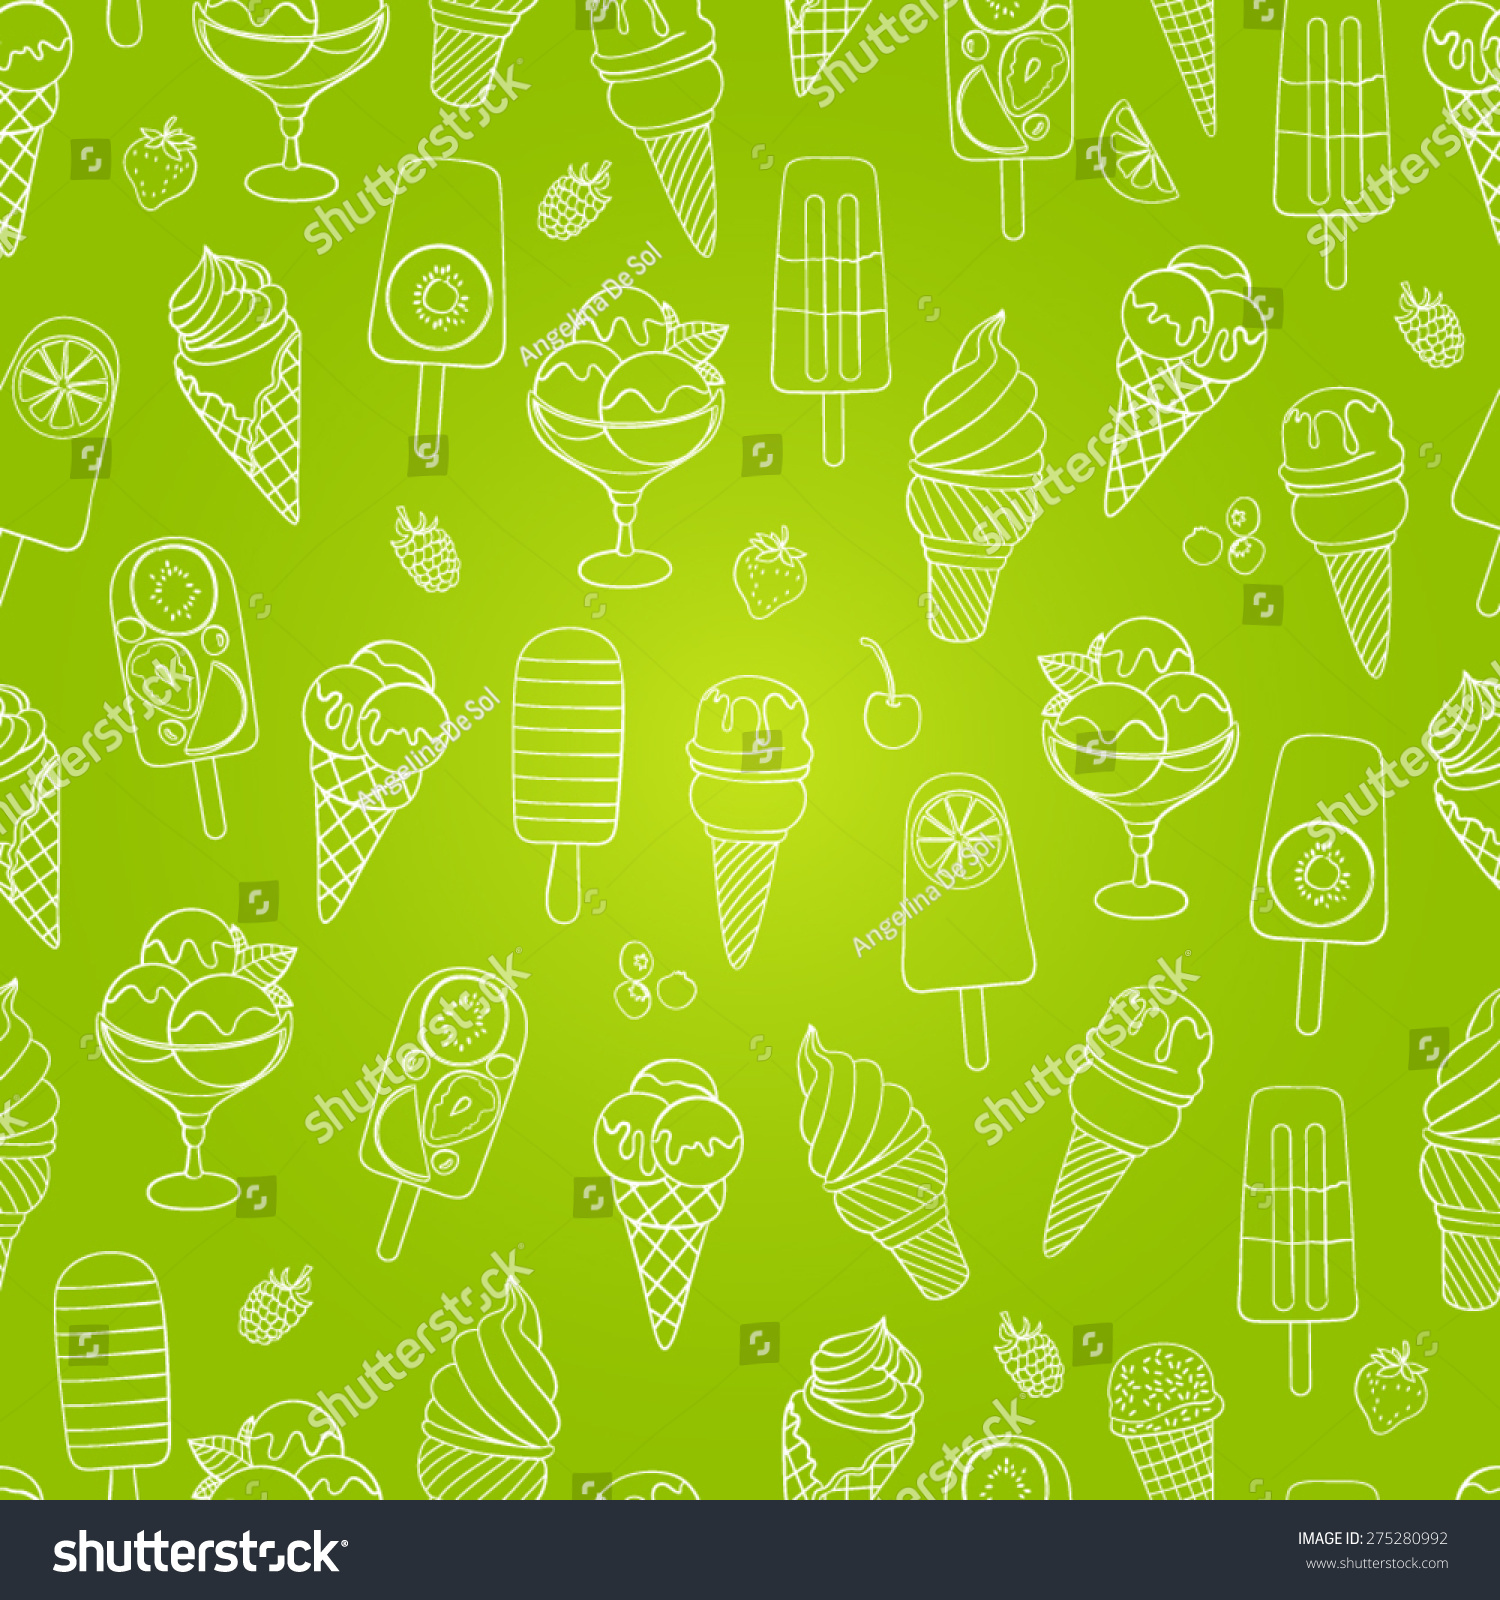 Seamless Ice Cream Background: Cute Seamless Ice Cream Pattern Vector Stock Vector